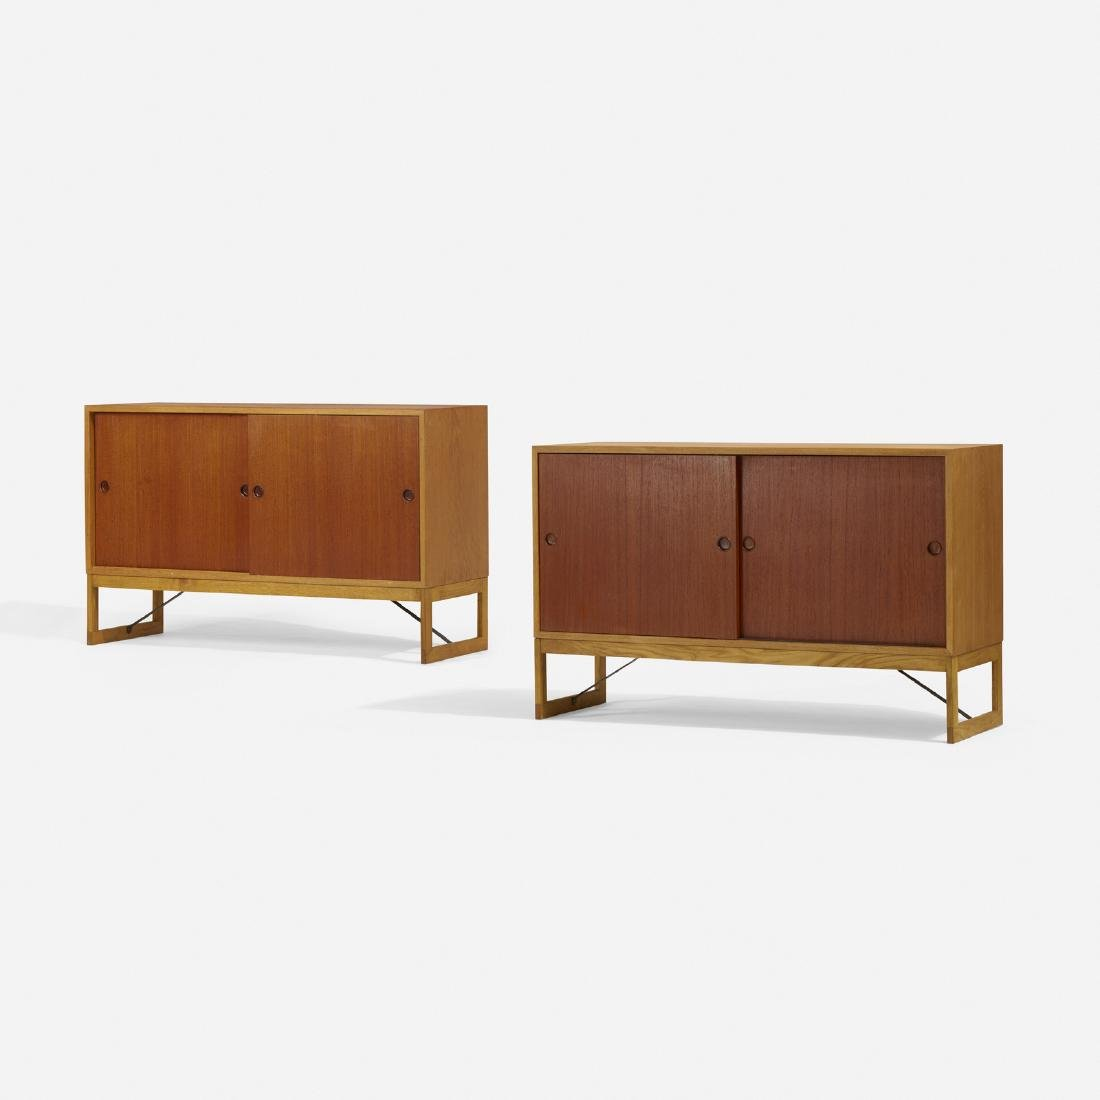 Borge Mogensen, cabinets, pair